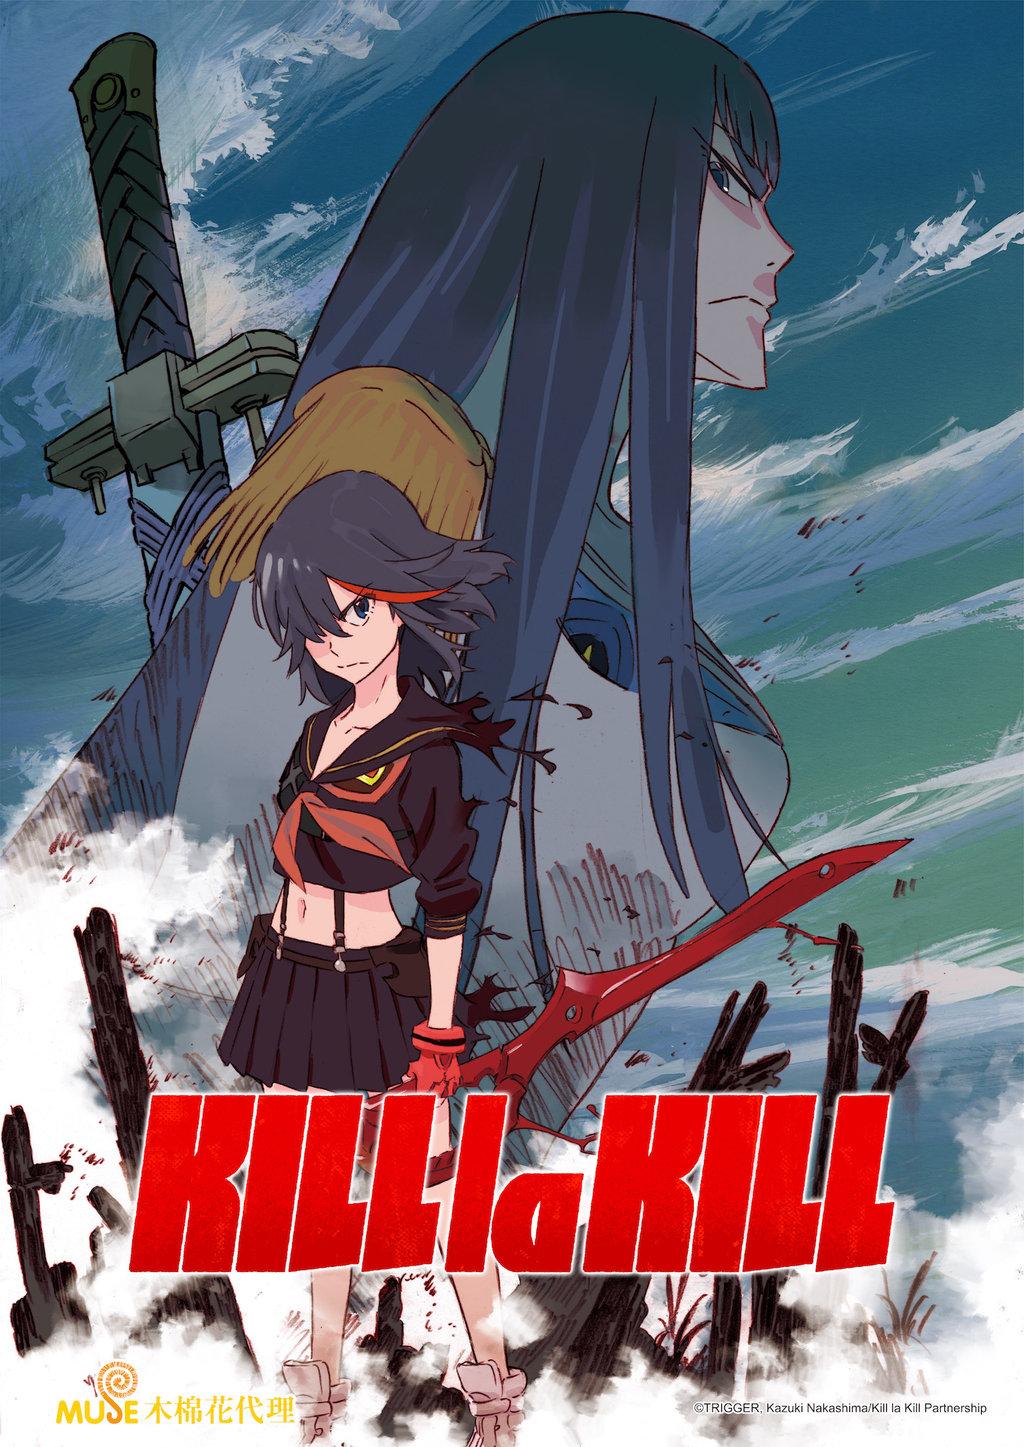 KILL la KILL (斬服少女)第11集|免費線上看|動漫|LINE TV-精彩隨看